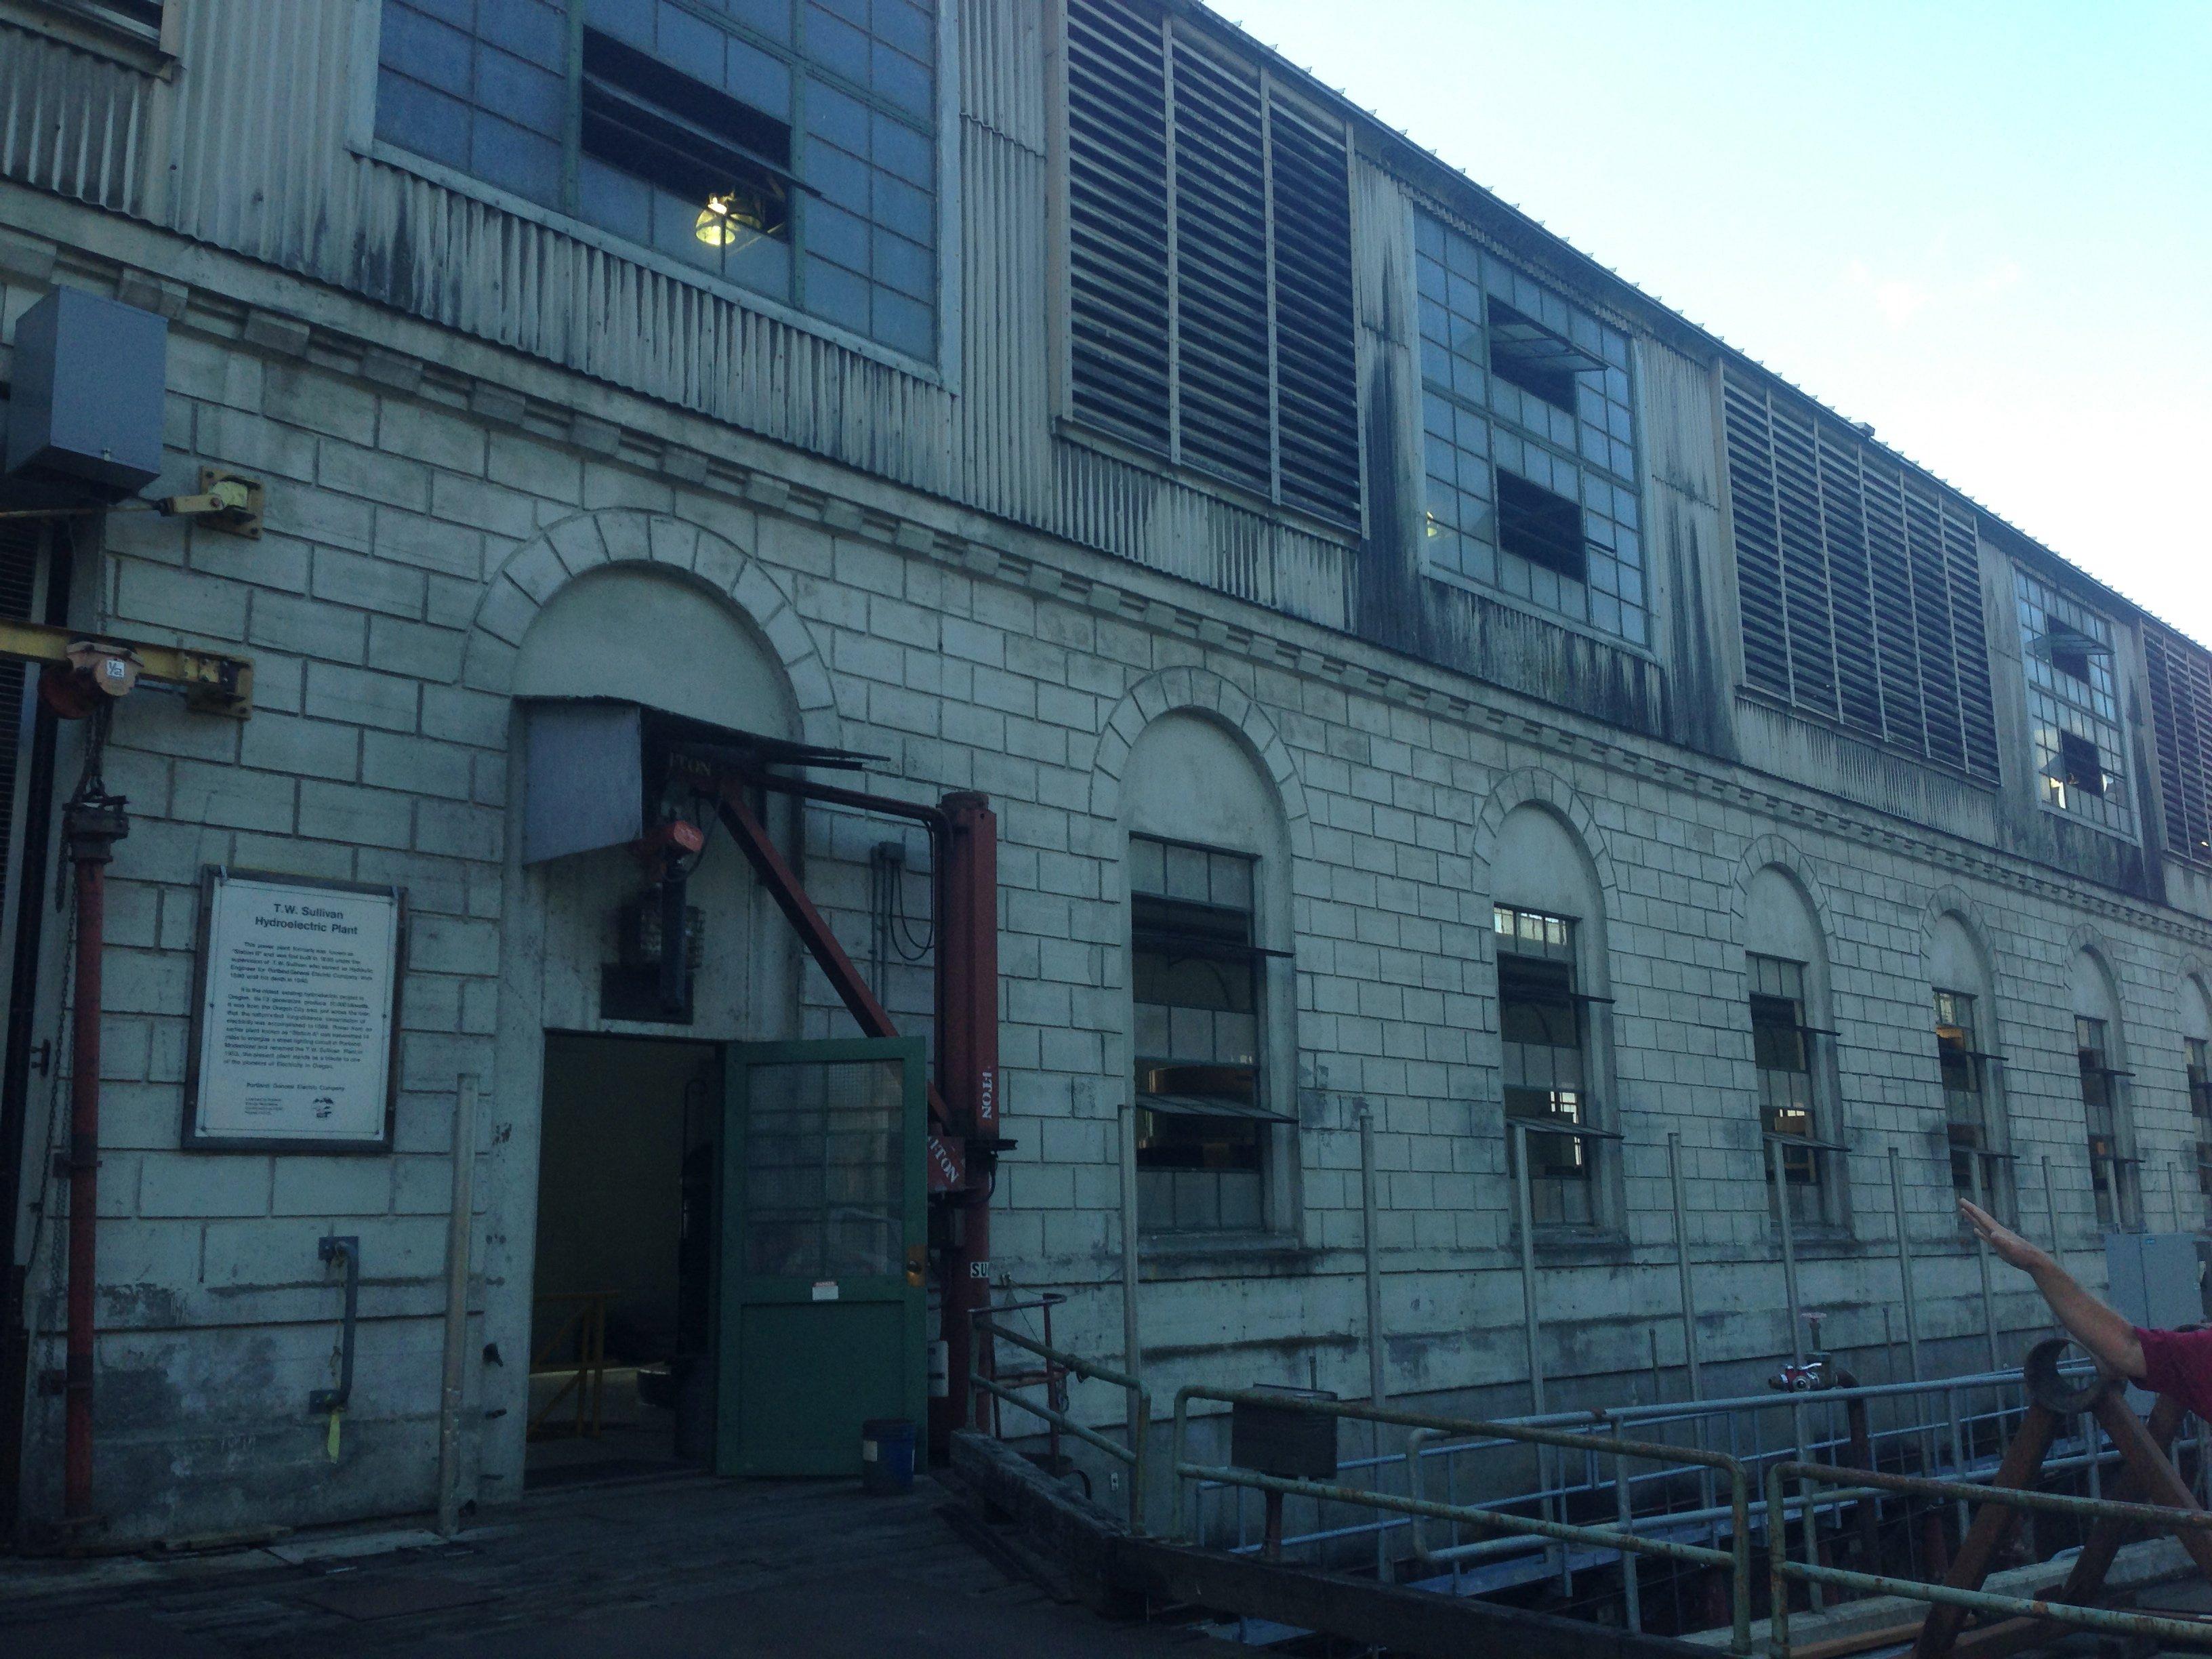 T. W. Sullivan Hydroelectric Plant